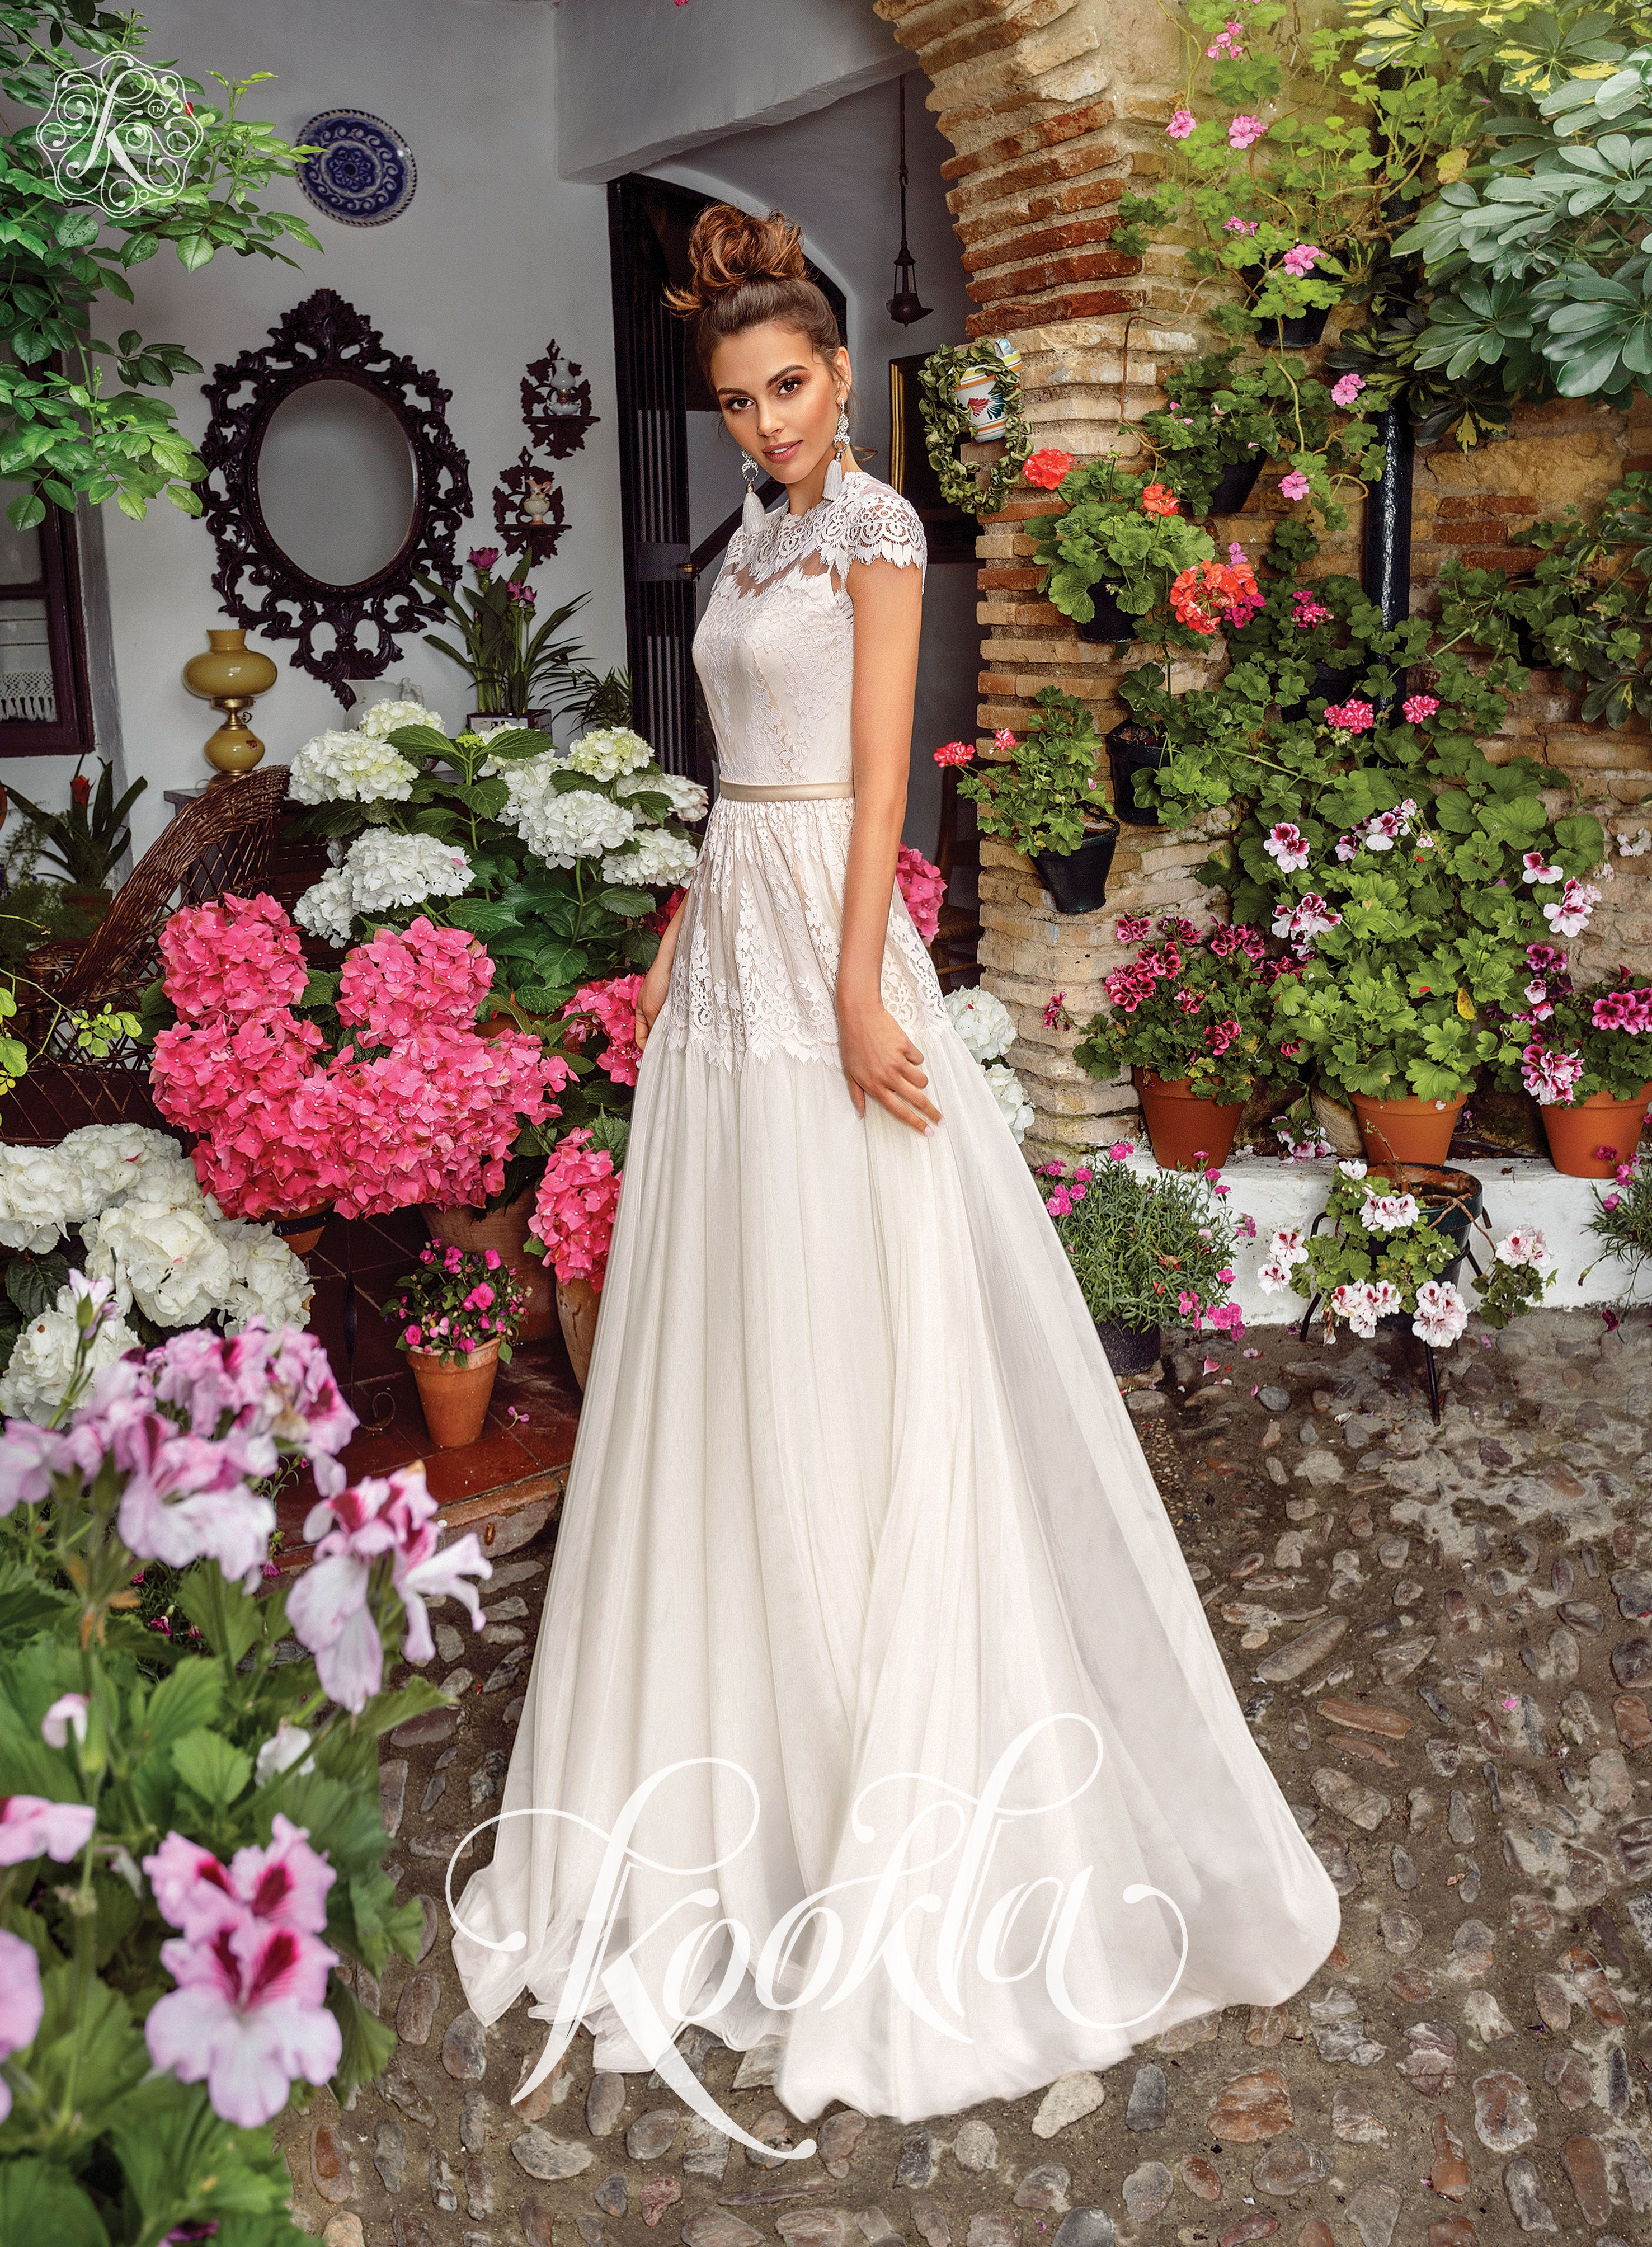 Uta Wedding Dress By Tatiana Kaplun Wedding Dresses Bay Area Wedding Dresses Bridal Gowns